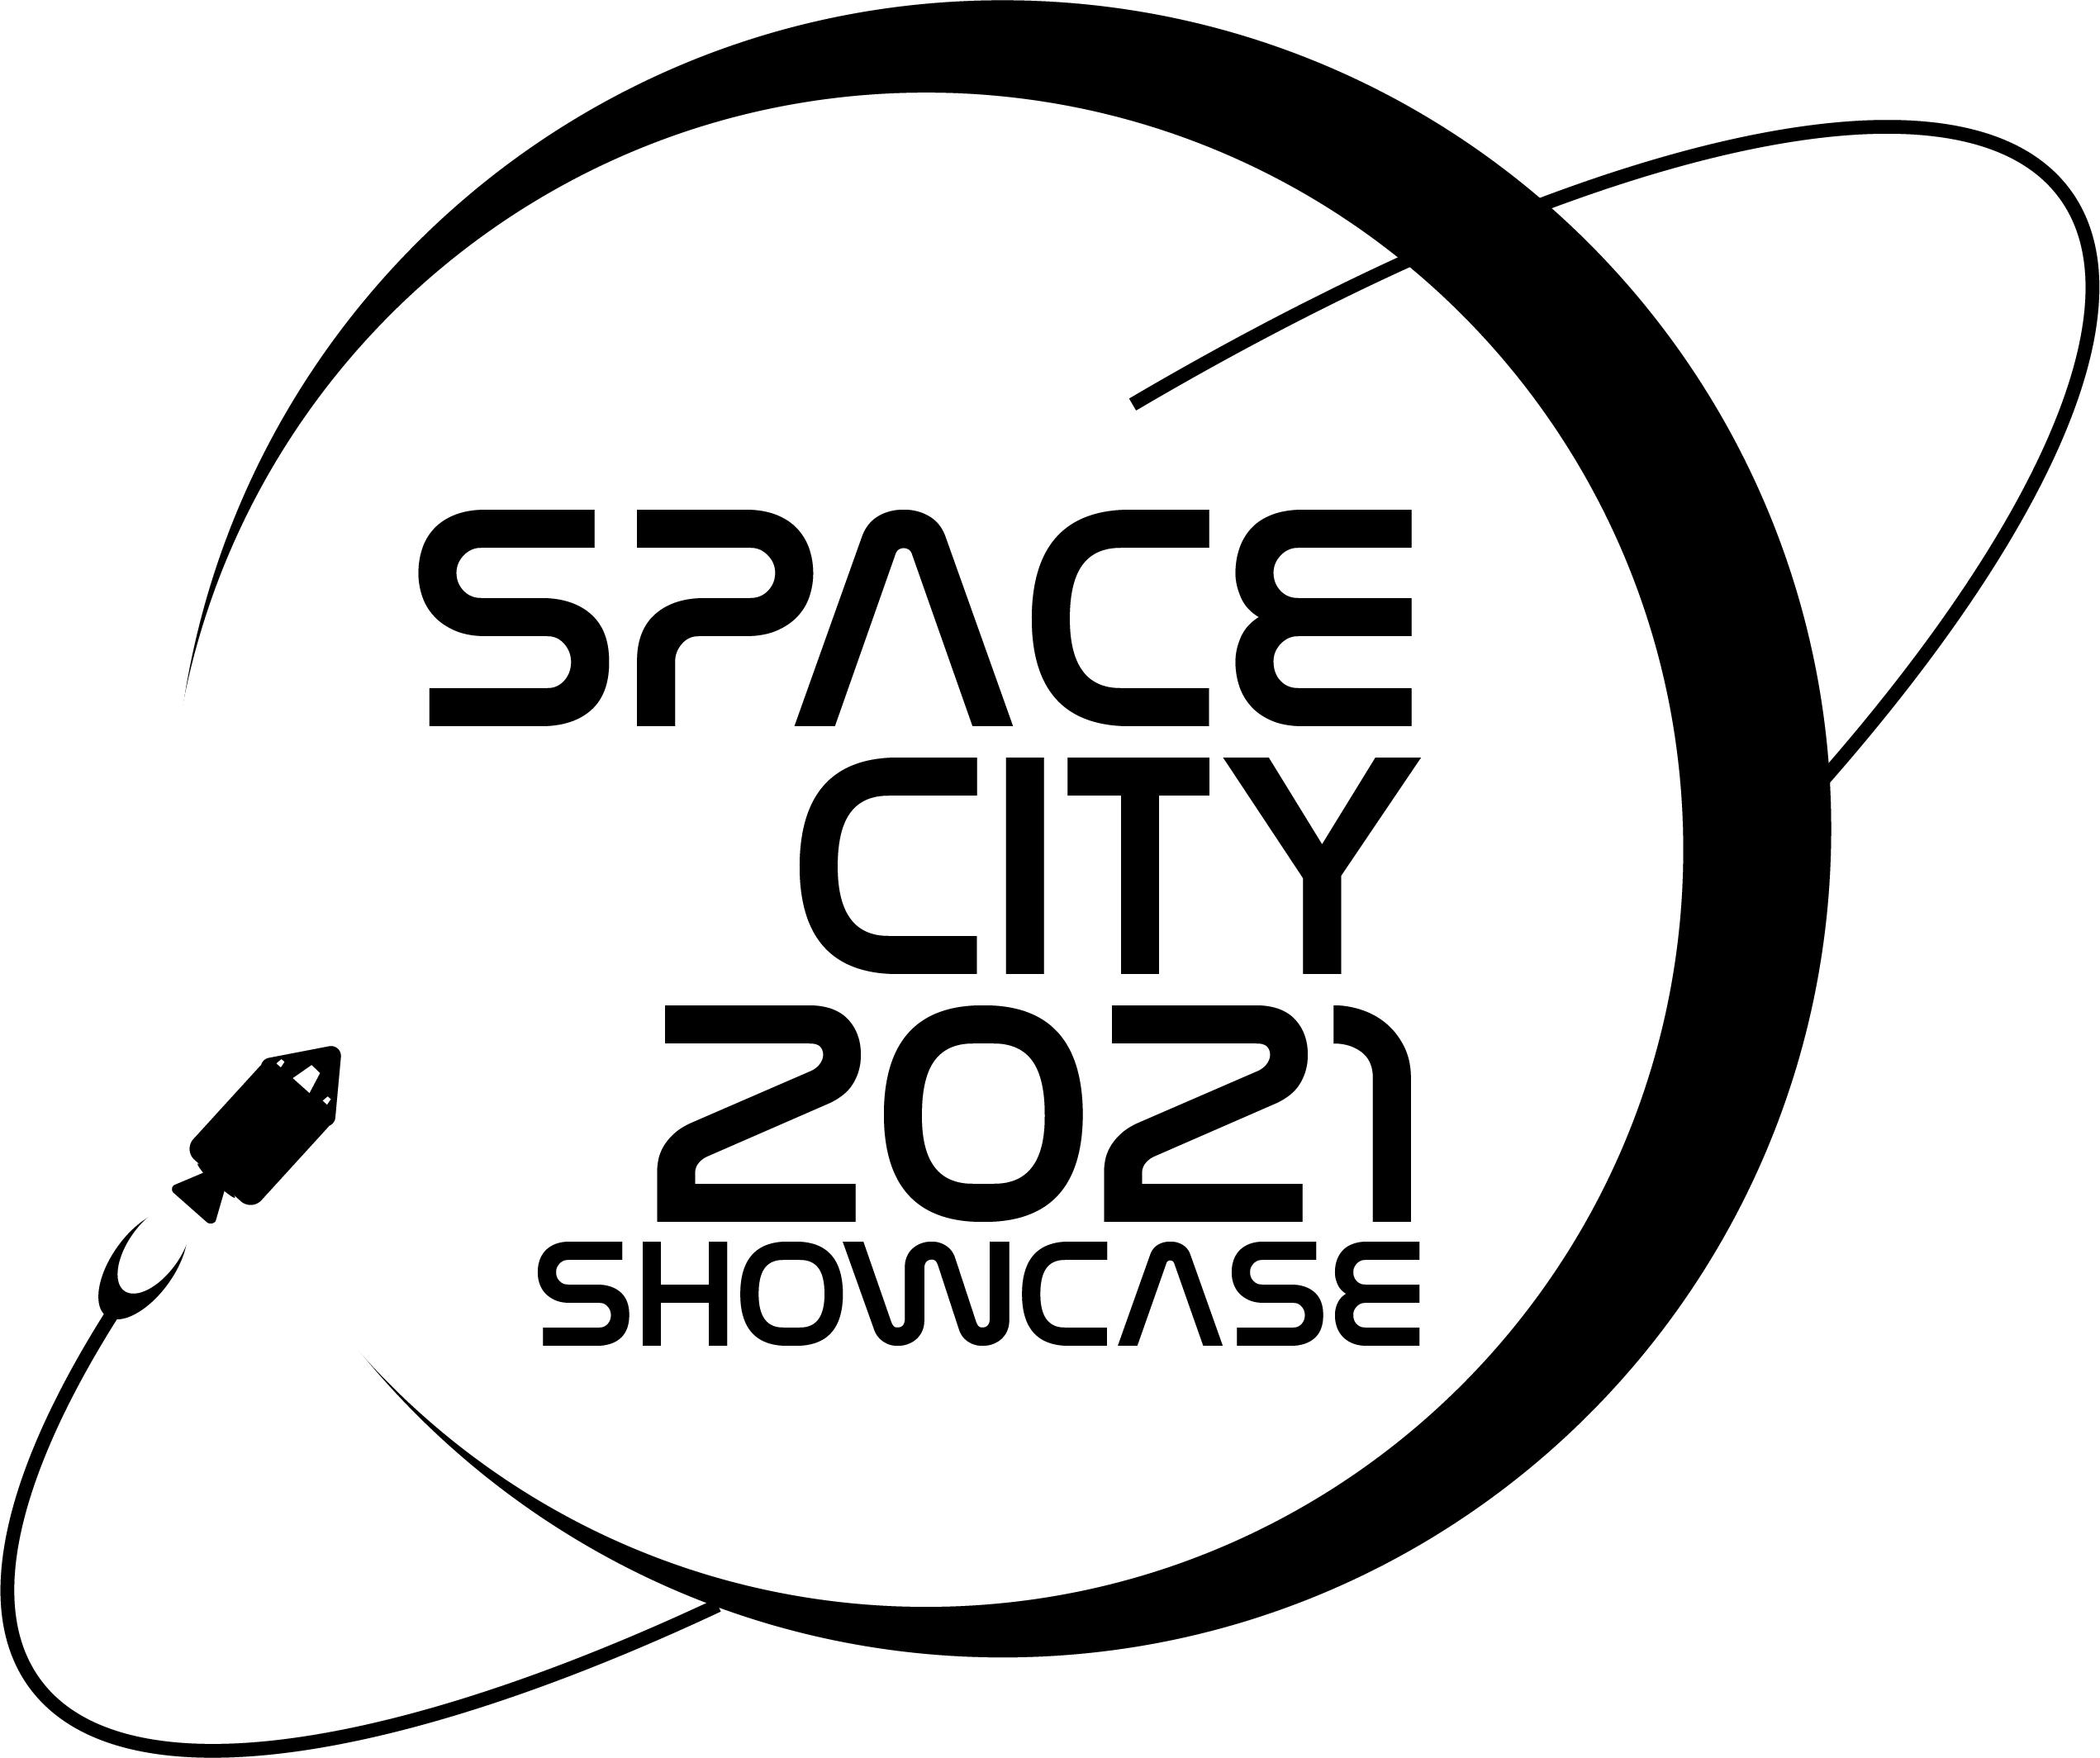 Showcase: Space City VEX IQ